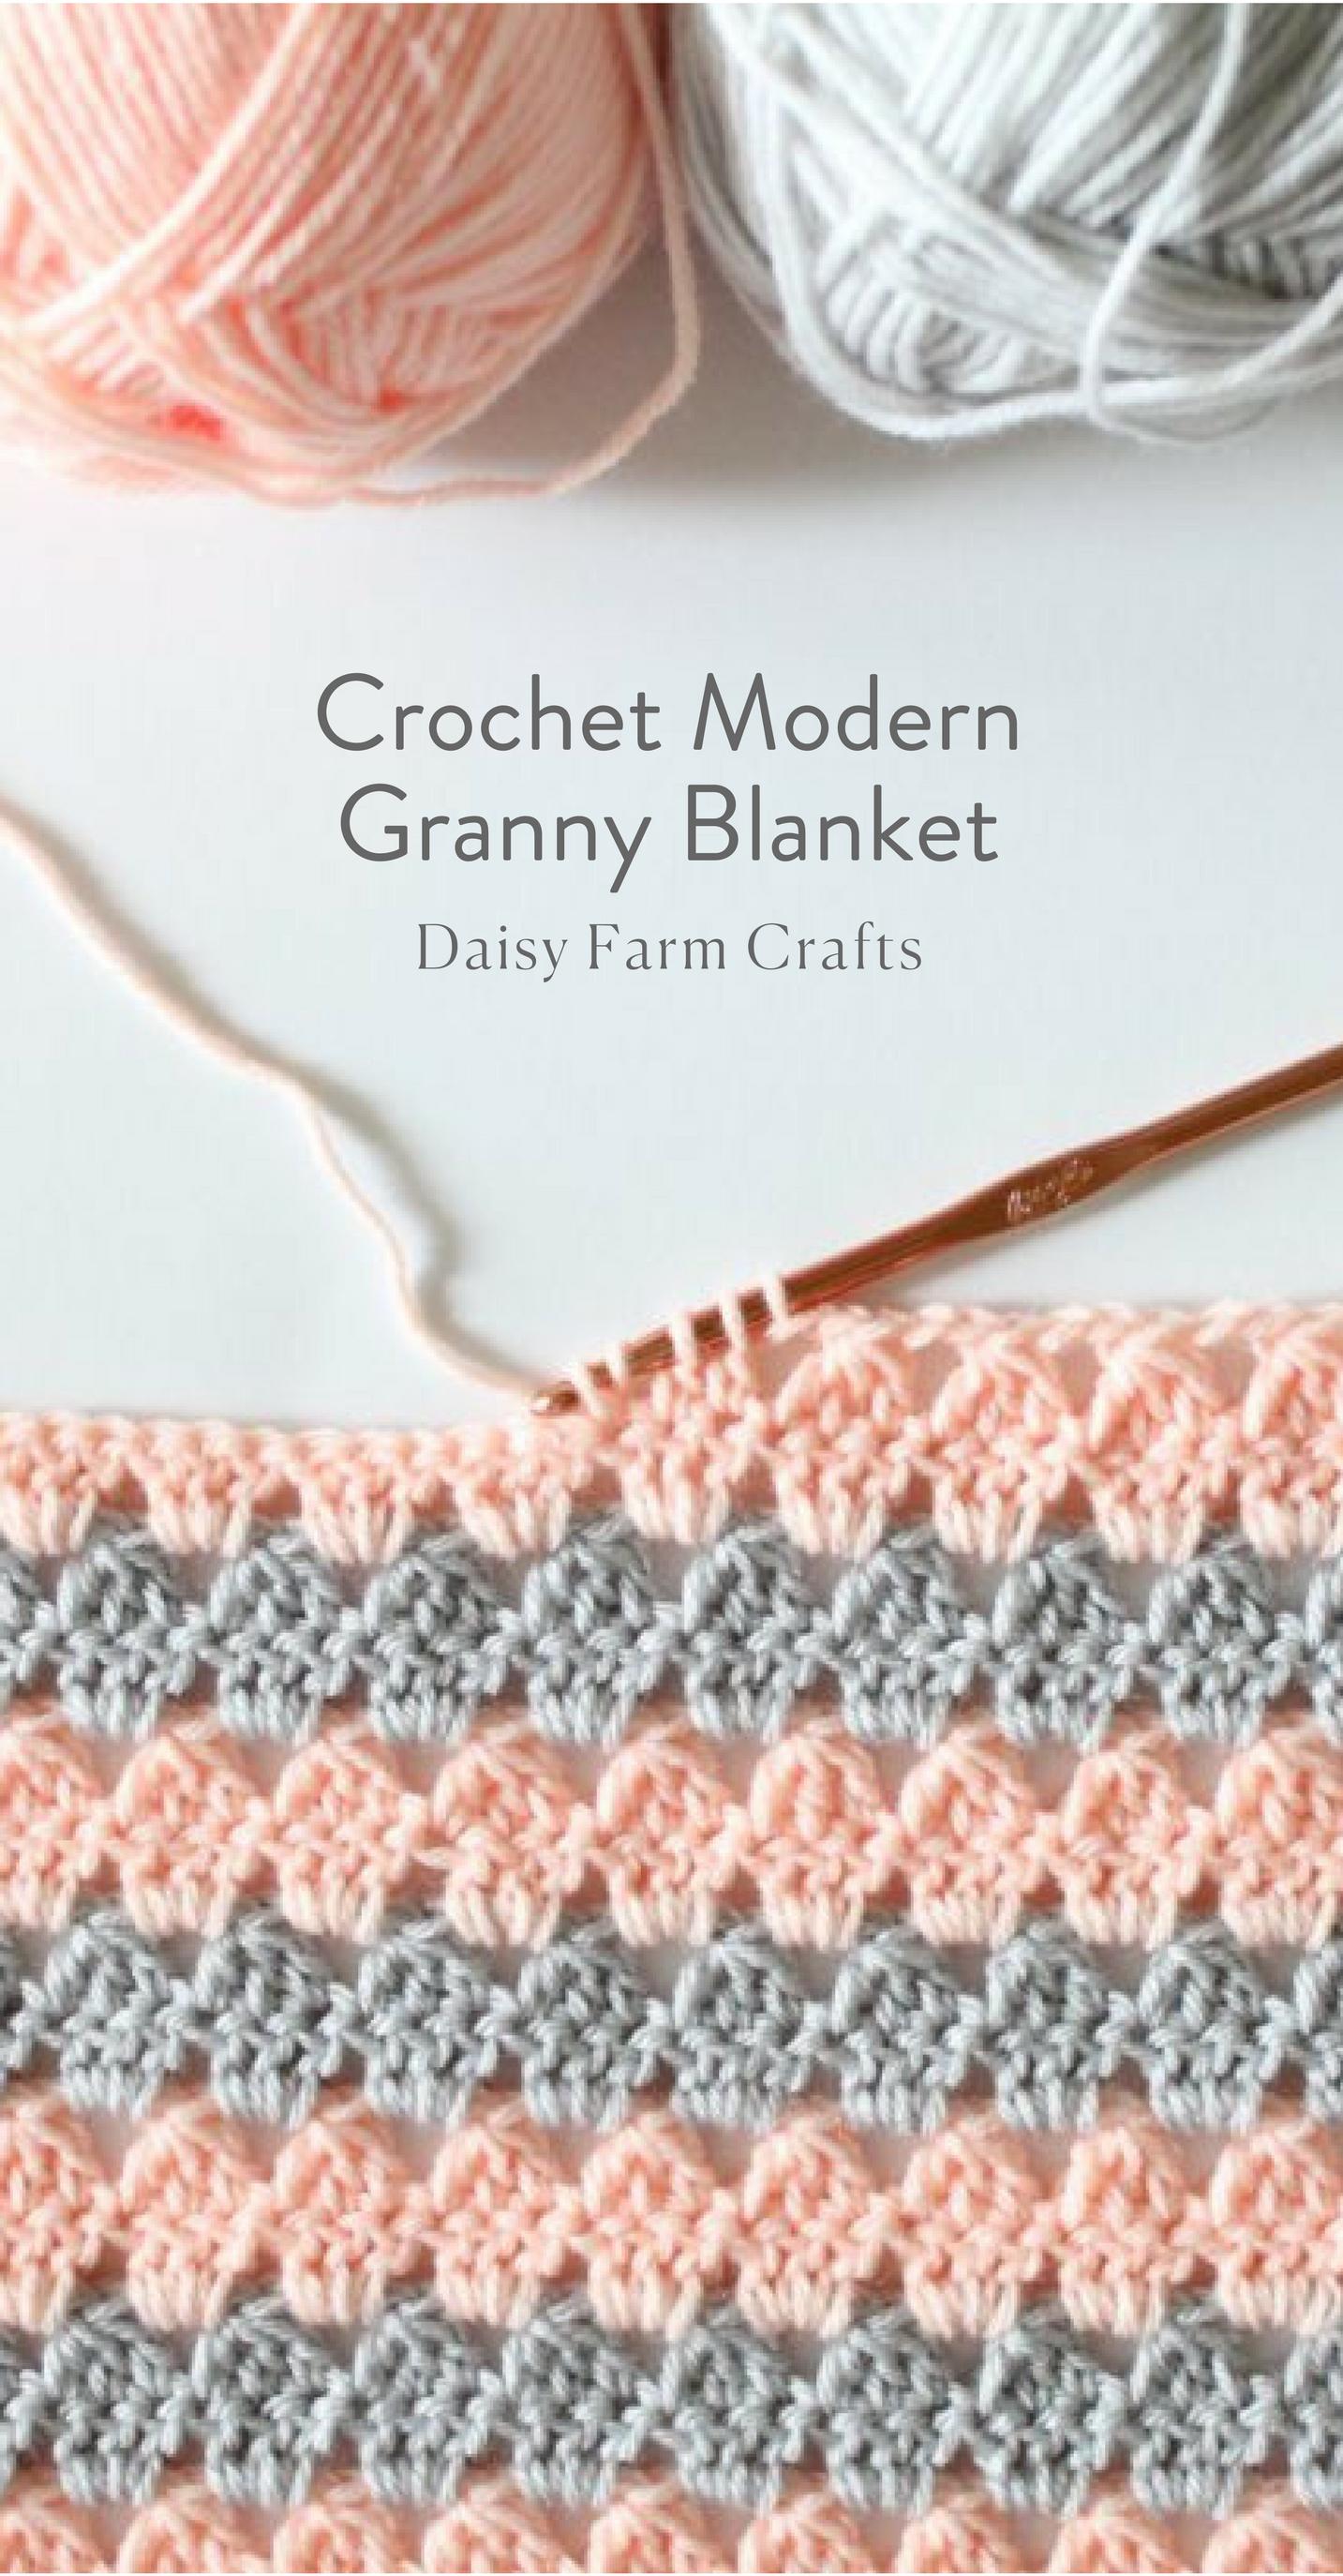 Free Pattern - Crochet Modern Granny Blanket | Manta | Pinterest ...